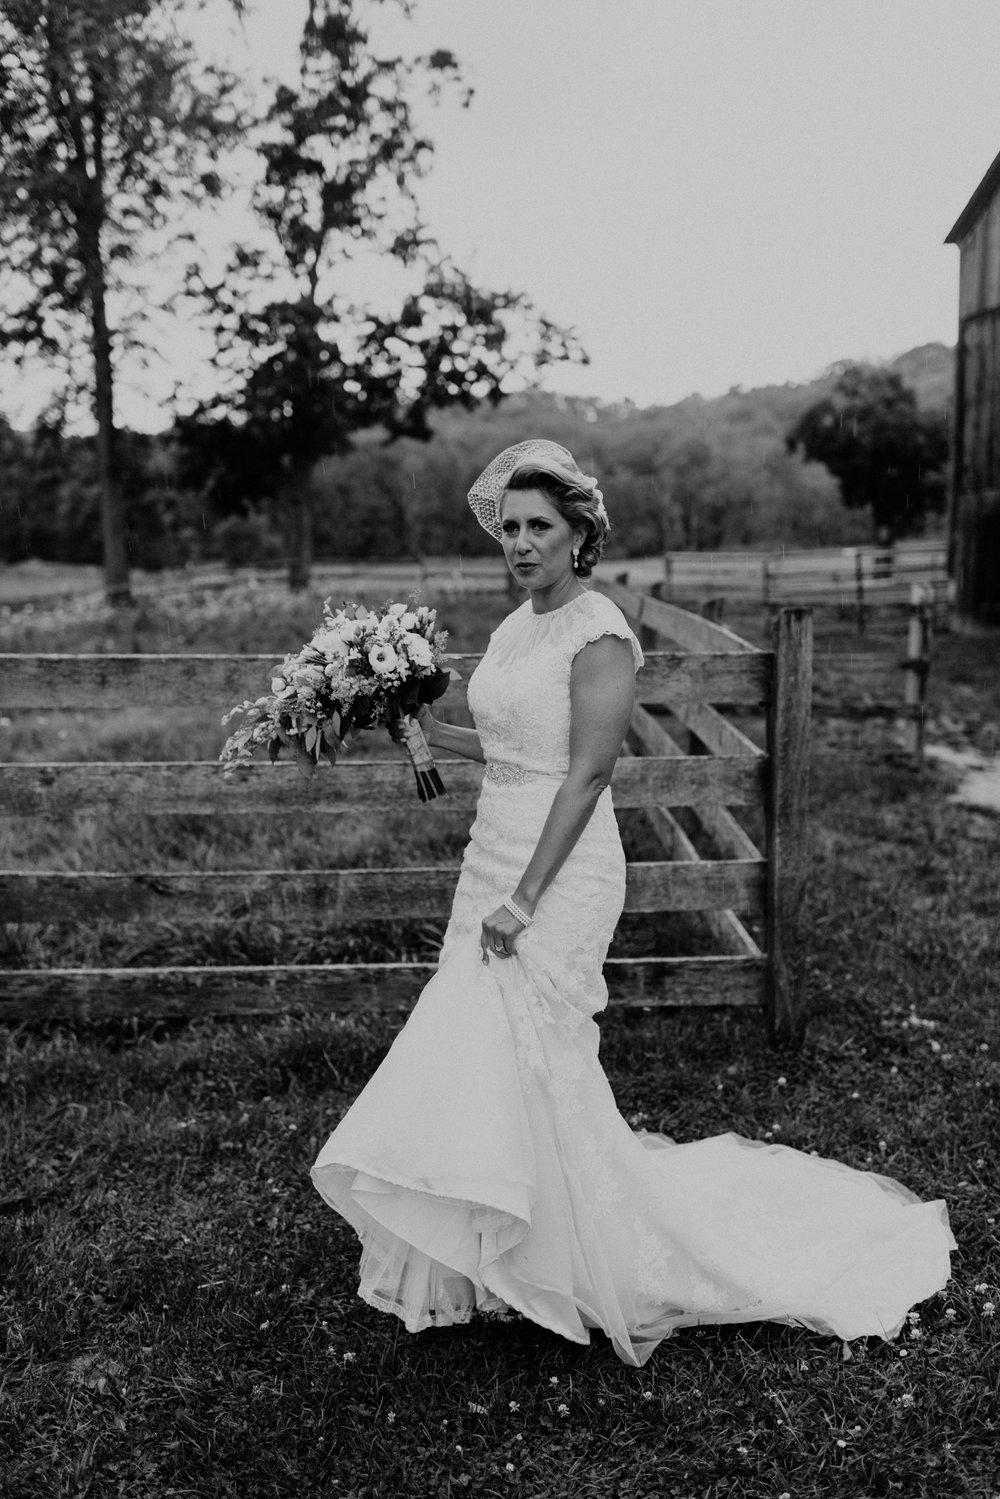 Hines-Hill-Farm-Cuyahoga-Valley-National-Park-Wedding_Emi+Andy_MJPHOTO-119.jpg